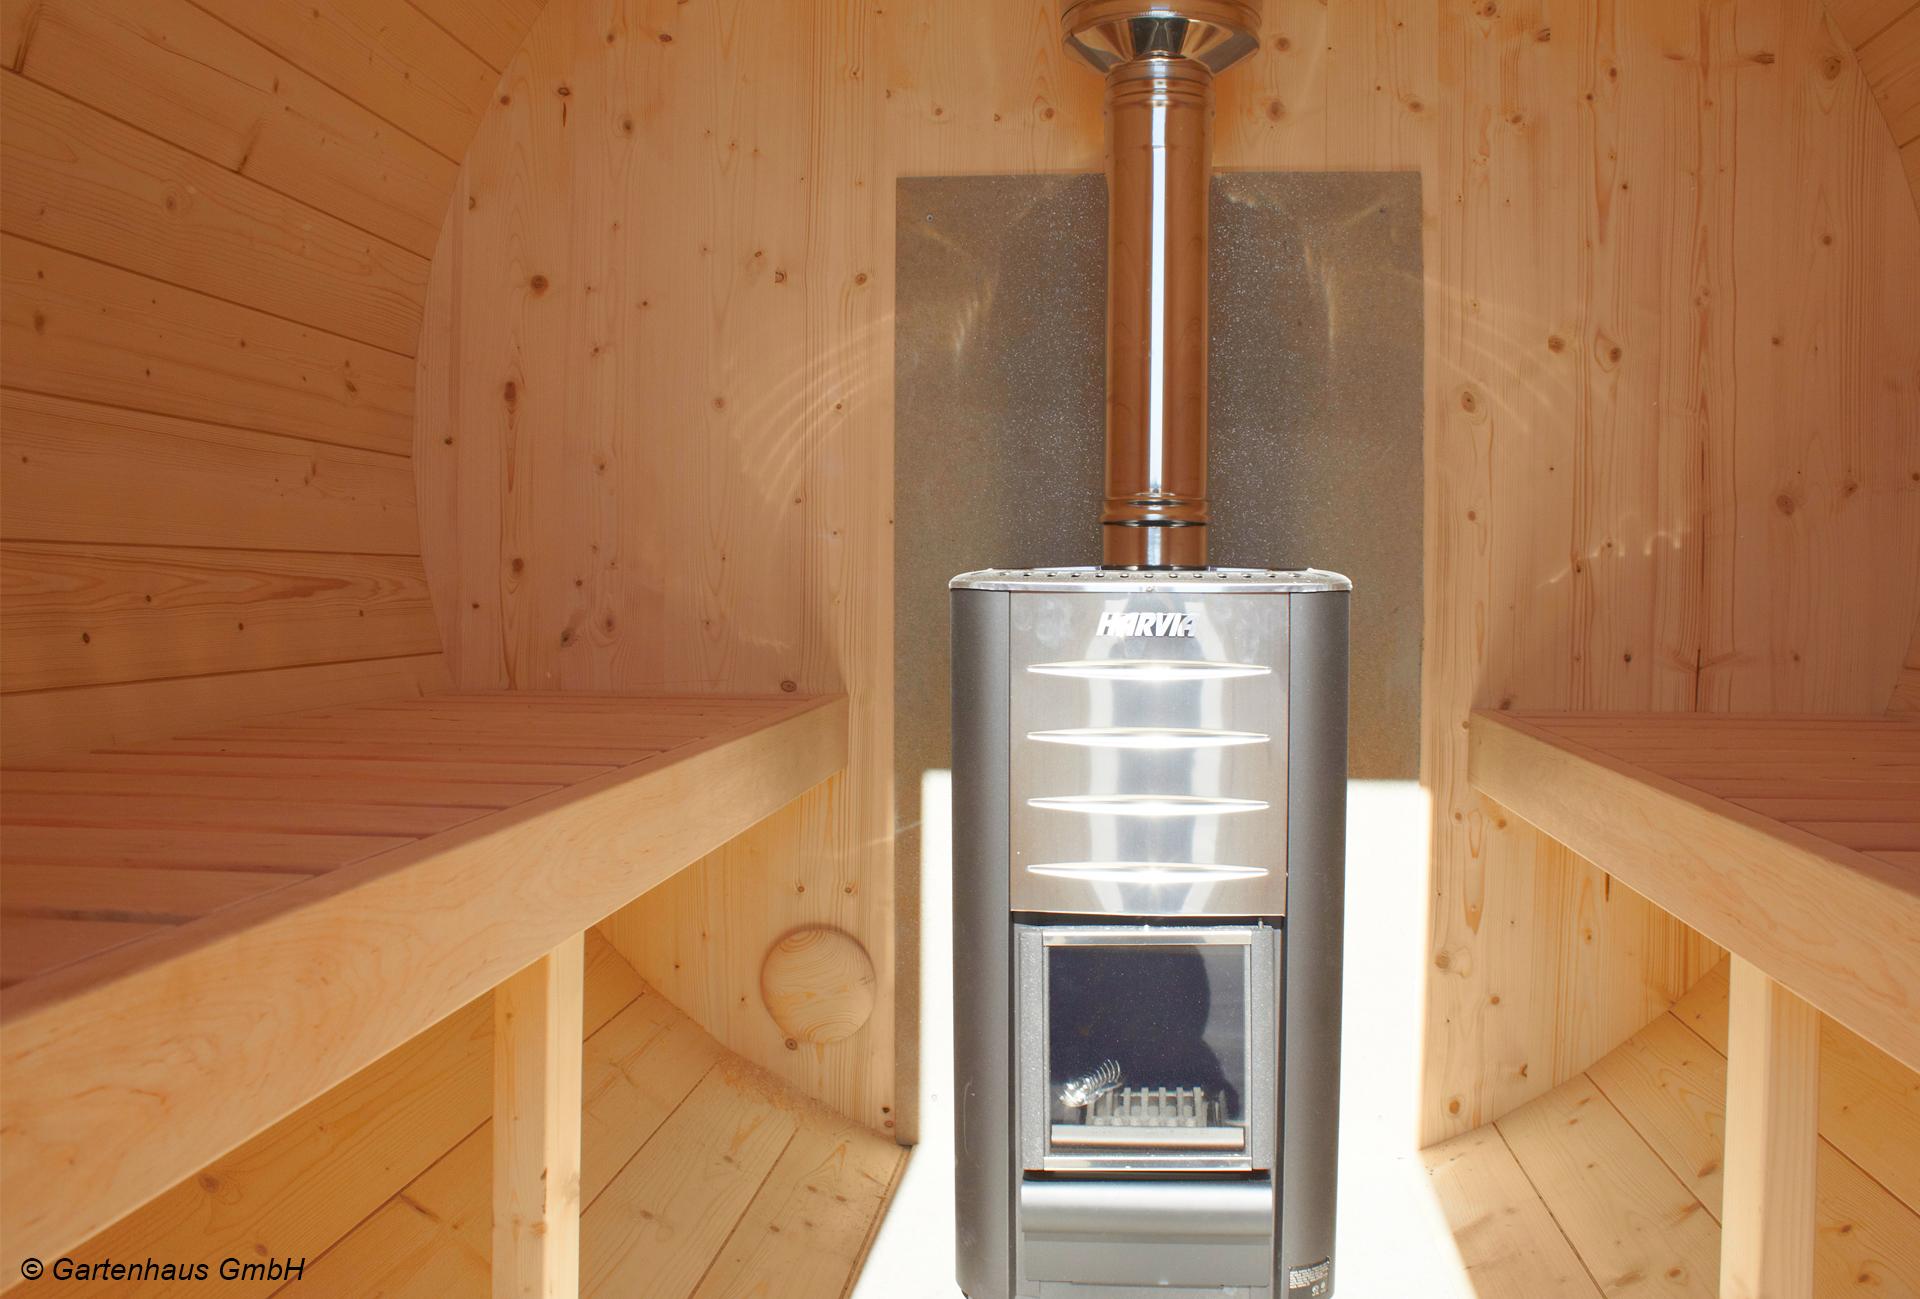 Harvia Holz Ofen im Innenraum